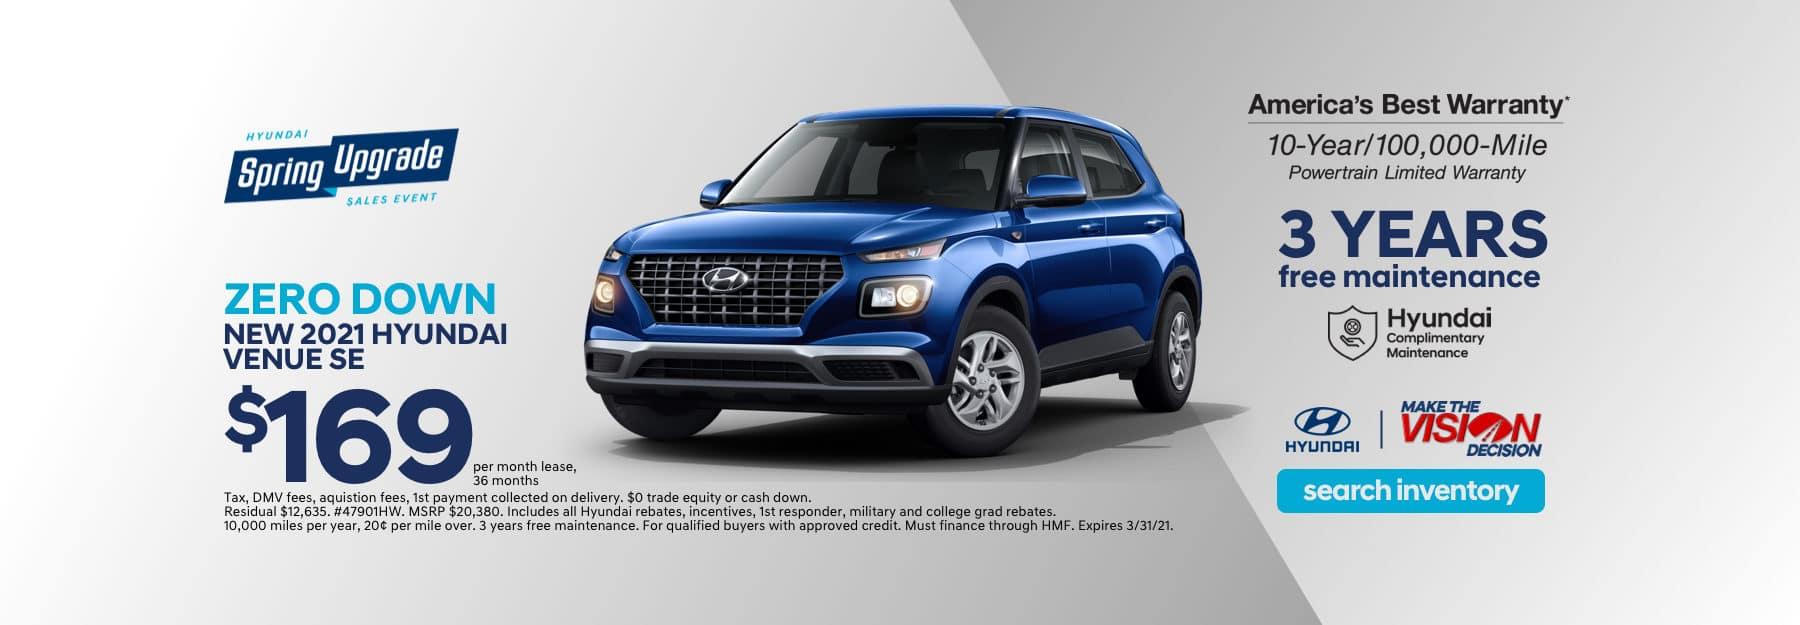 Vision-Hyundai-Sliders-0304-Venue